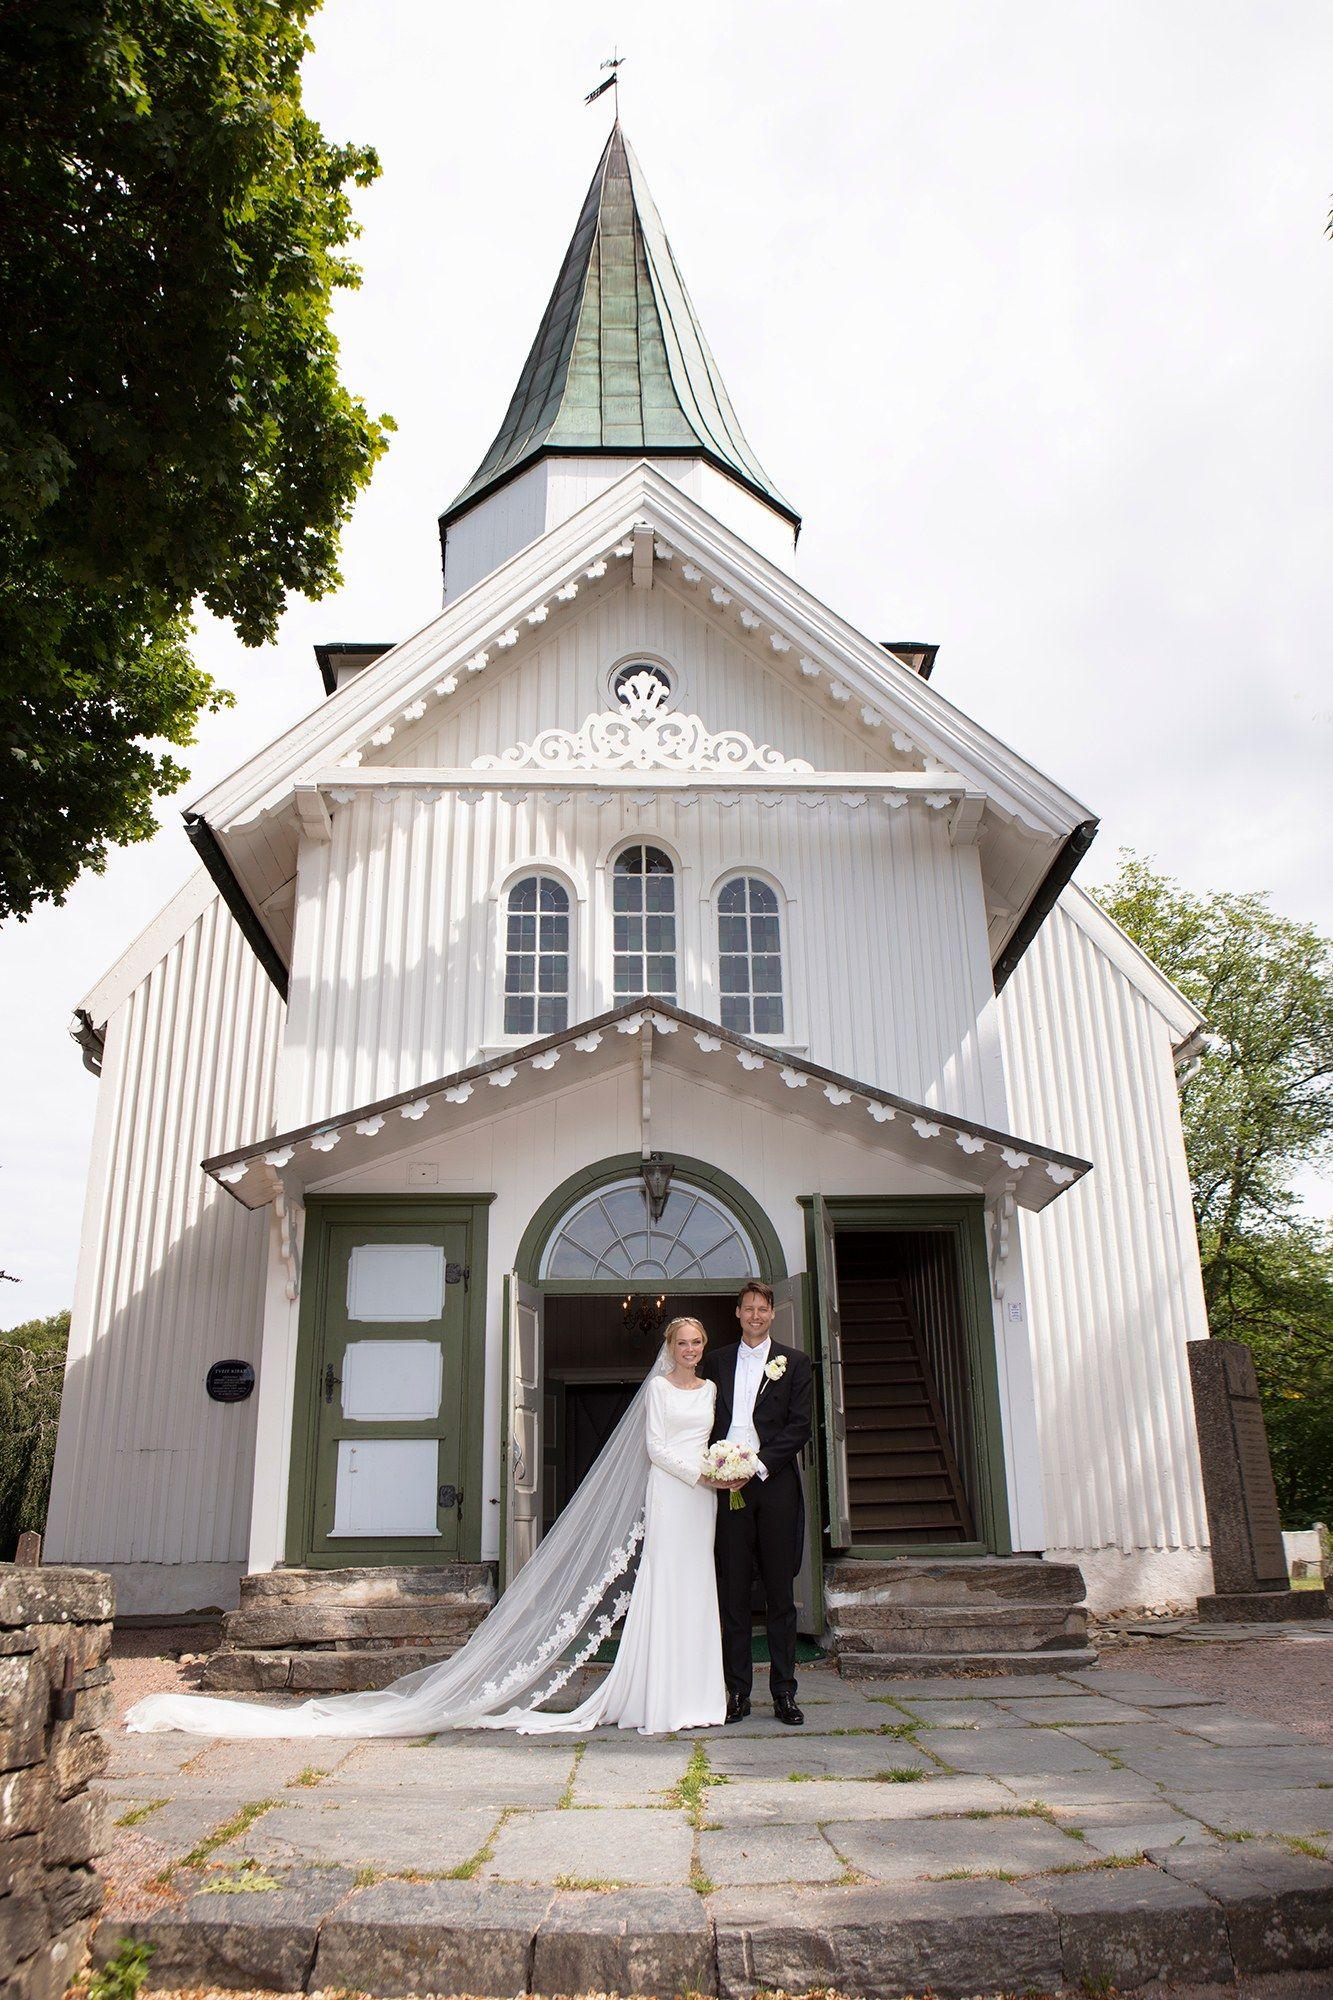 Siri Tollerød And Martin Steffensens Wedding In The